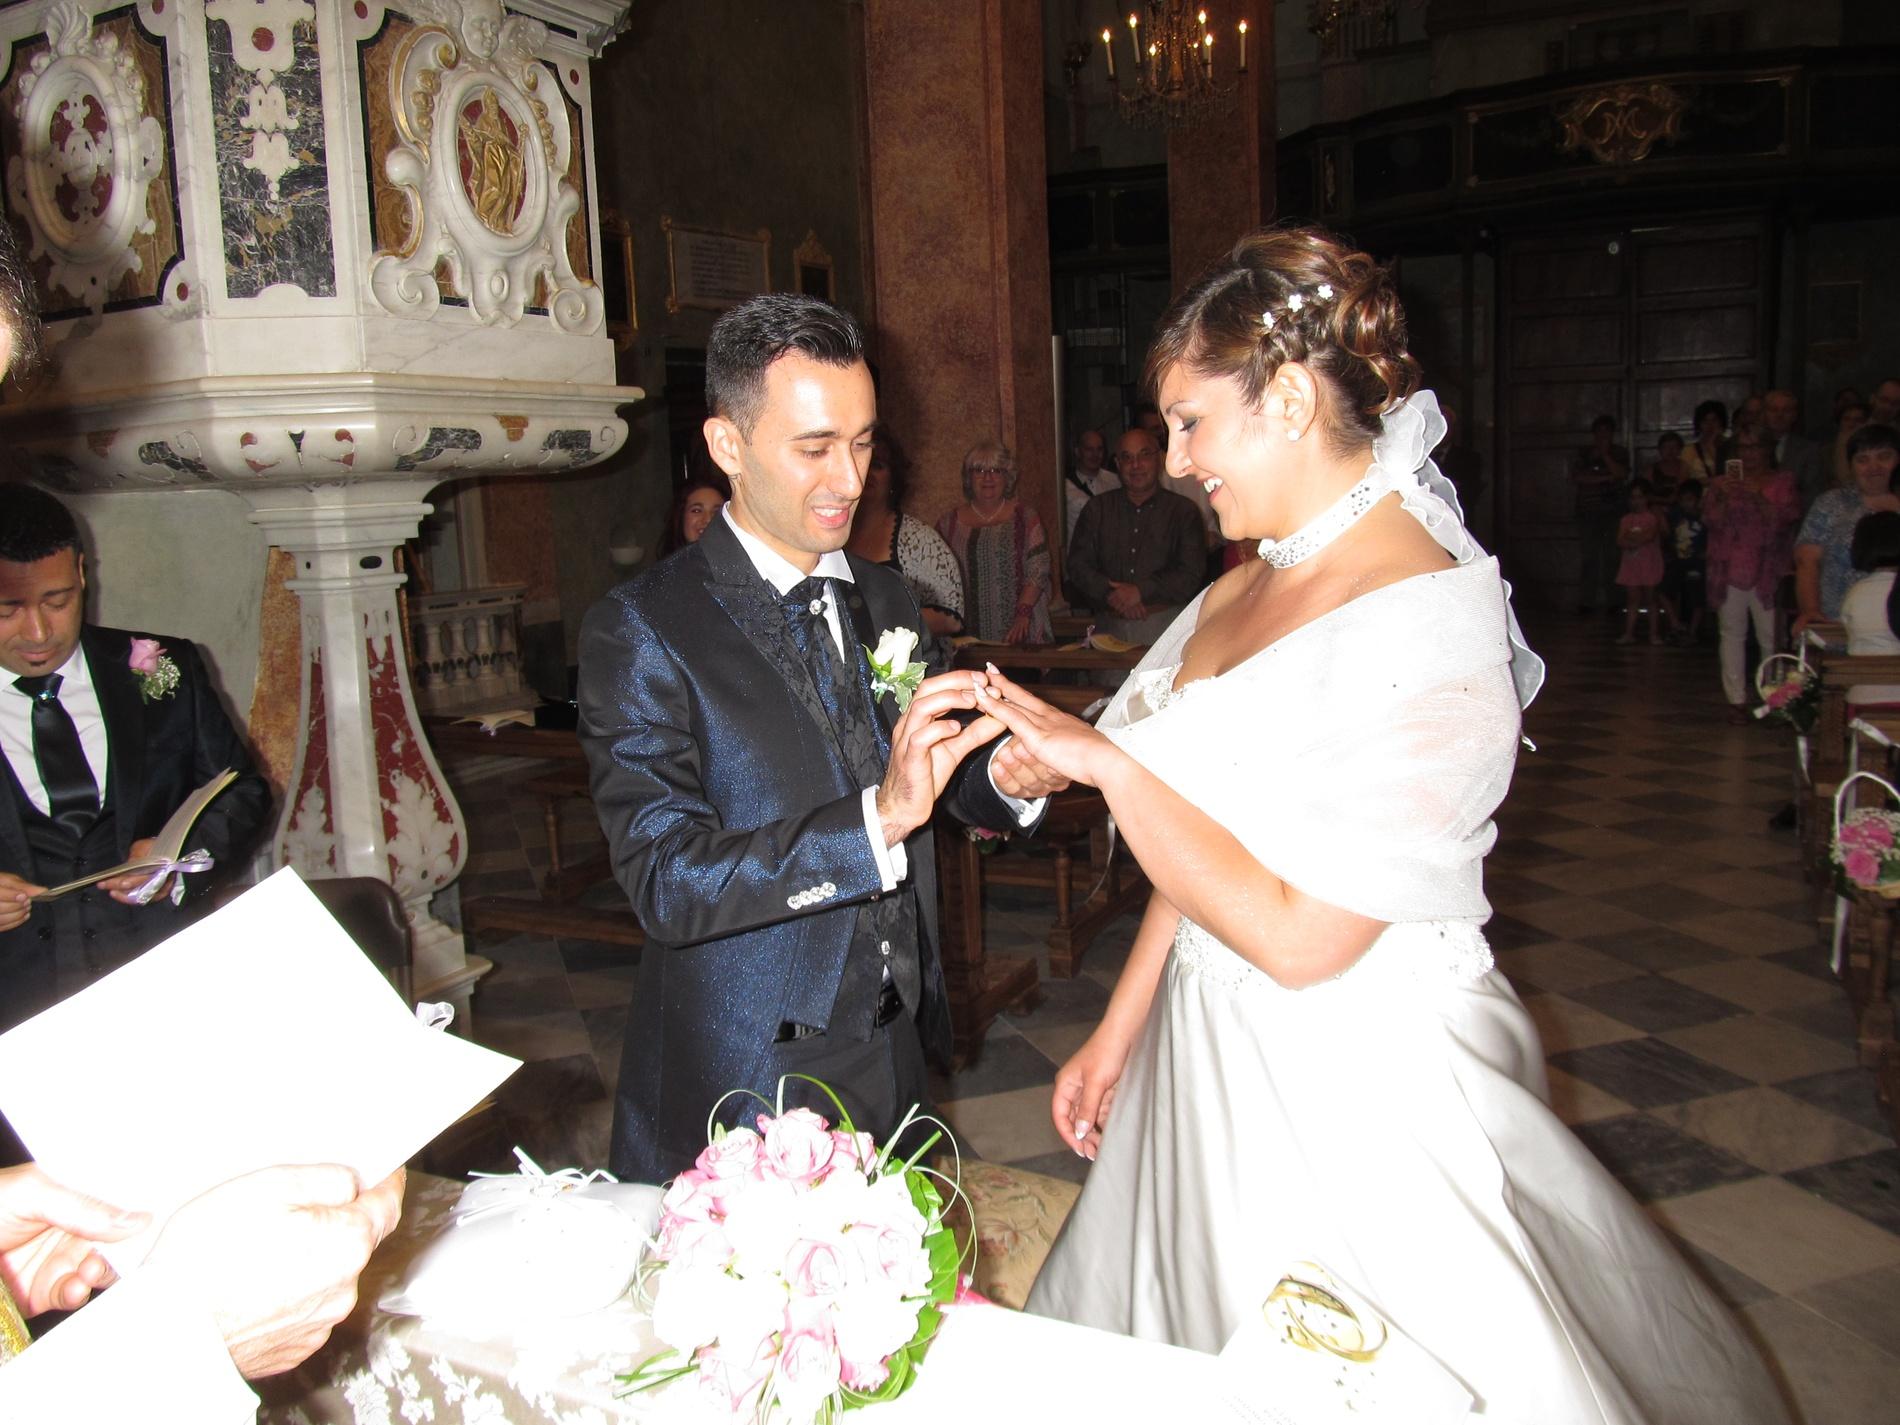 matrimonio-vicari-scino-2015-06-20-11-04-15